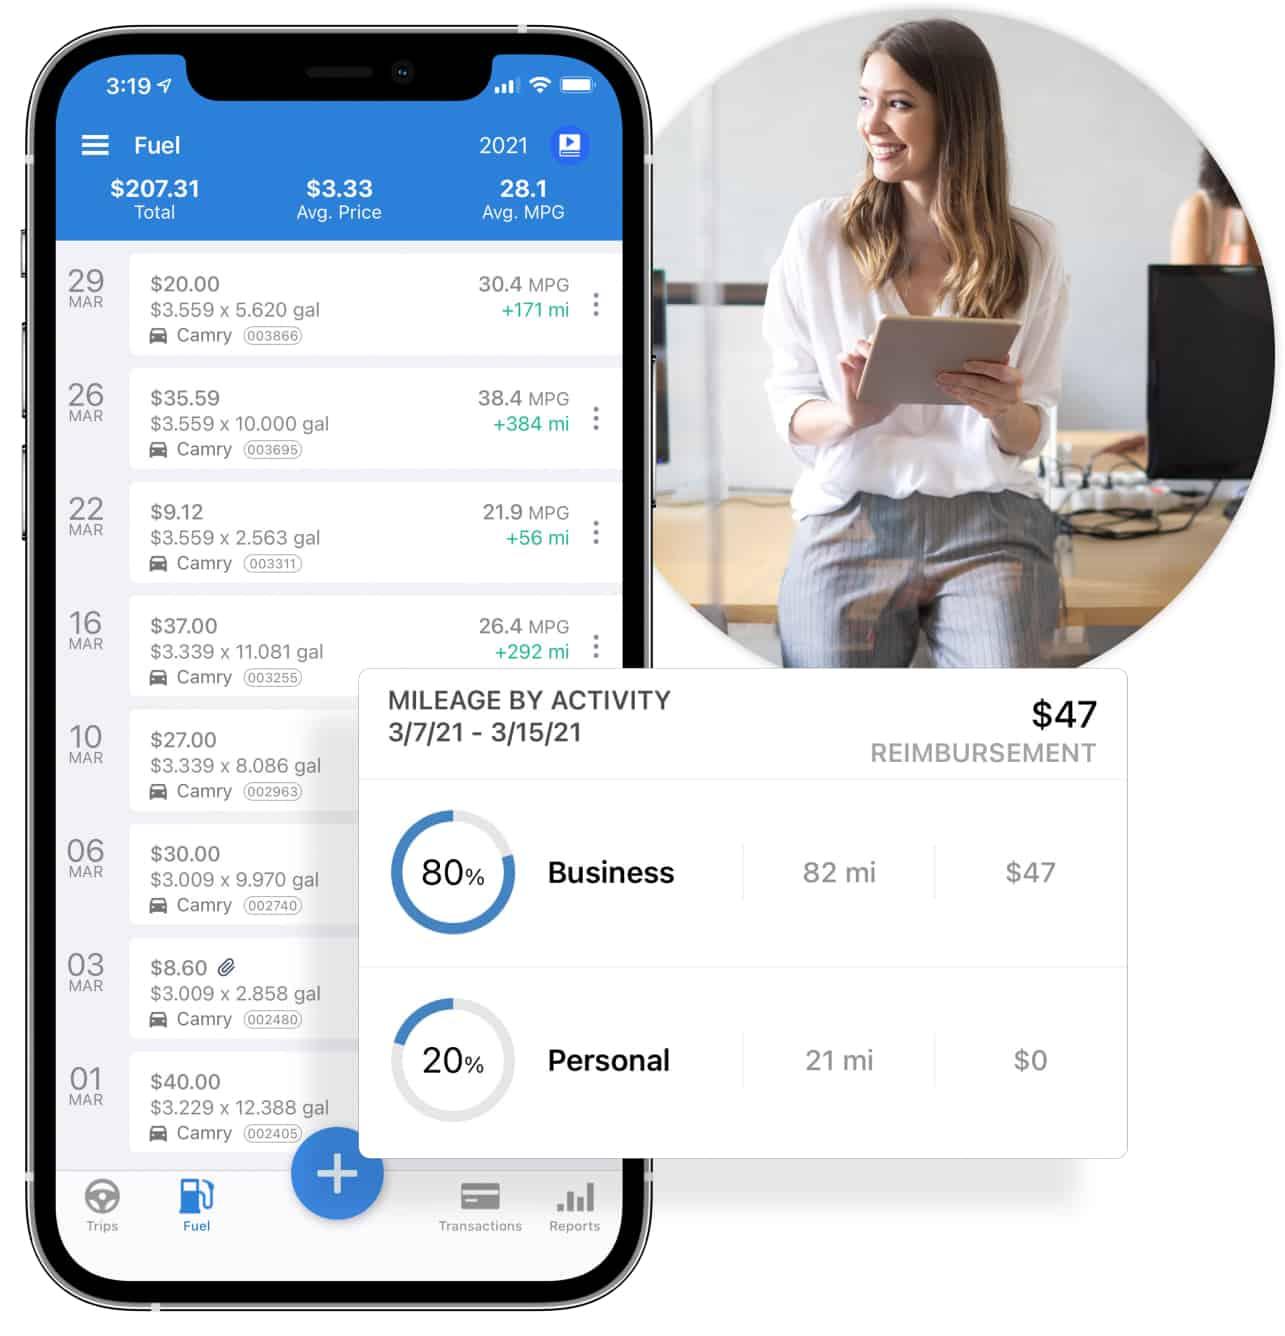 triplog is the best mileage reimbursement platform for teams and companies